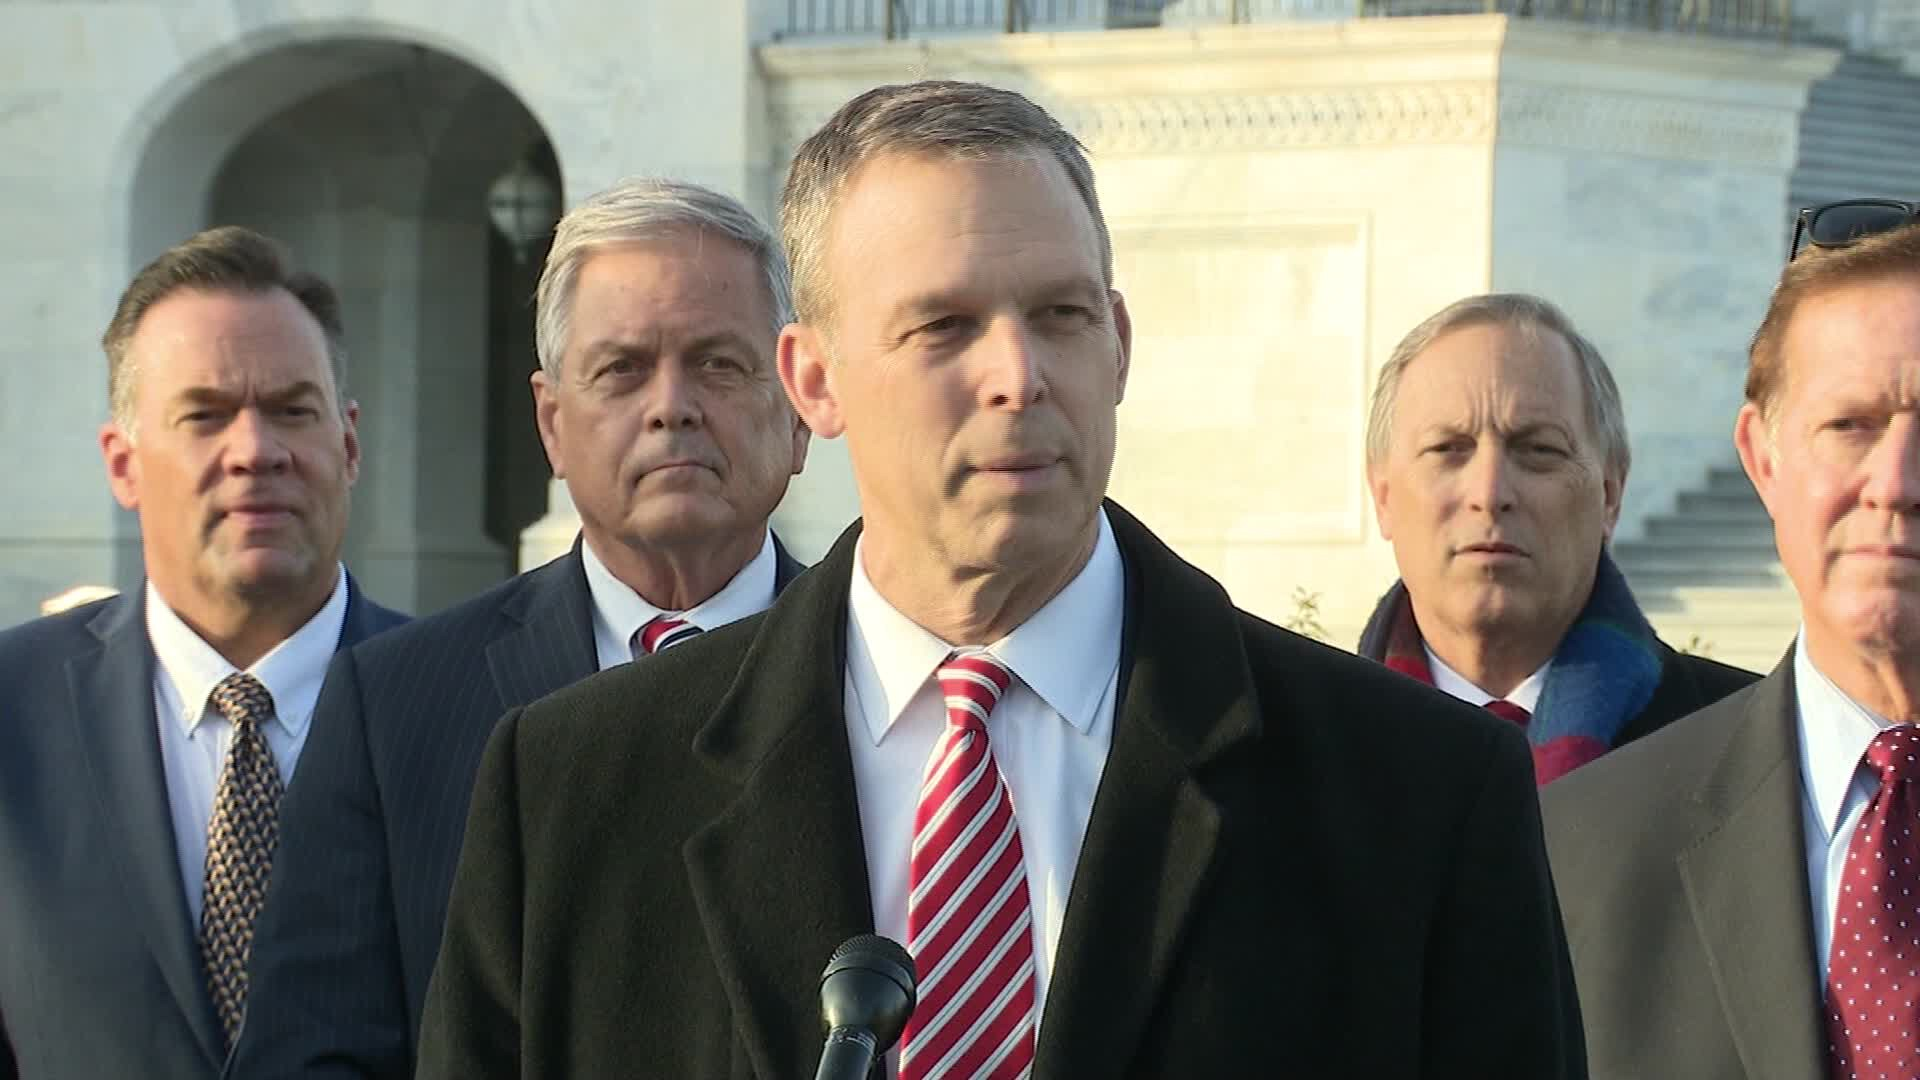 Democrats scrutinize Pennsylvania congressman's efforts to help Trump overturn 2020 election